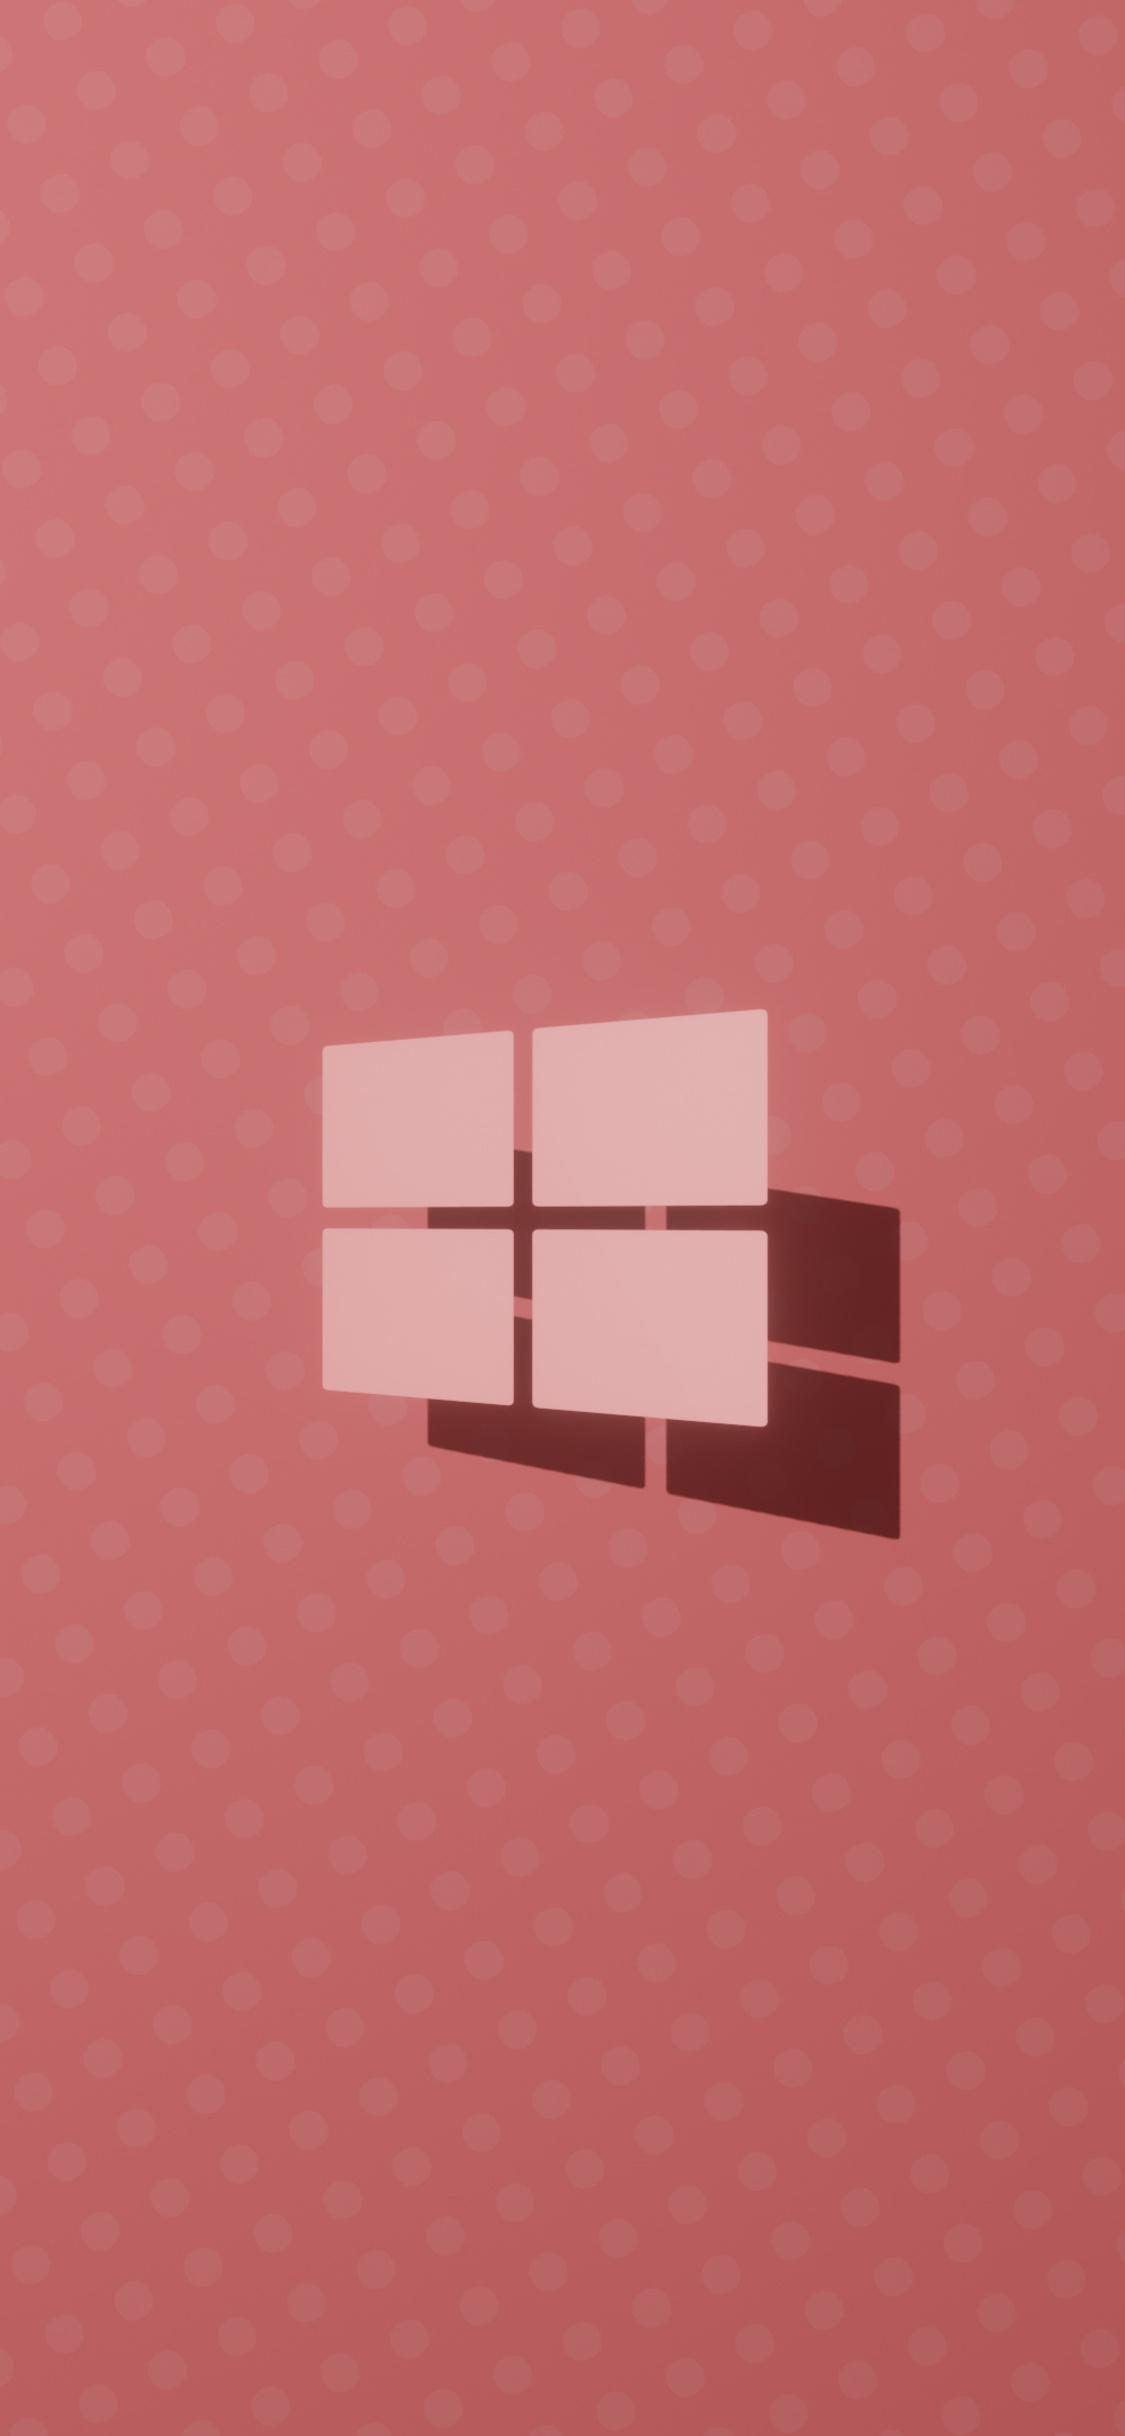 windows-10-logo-pink-4k-a9.jpg